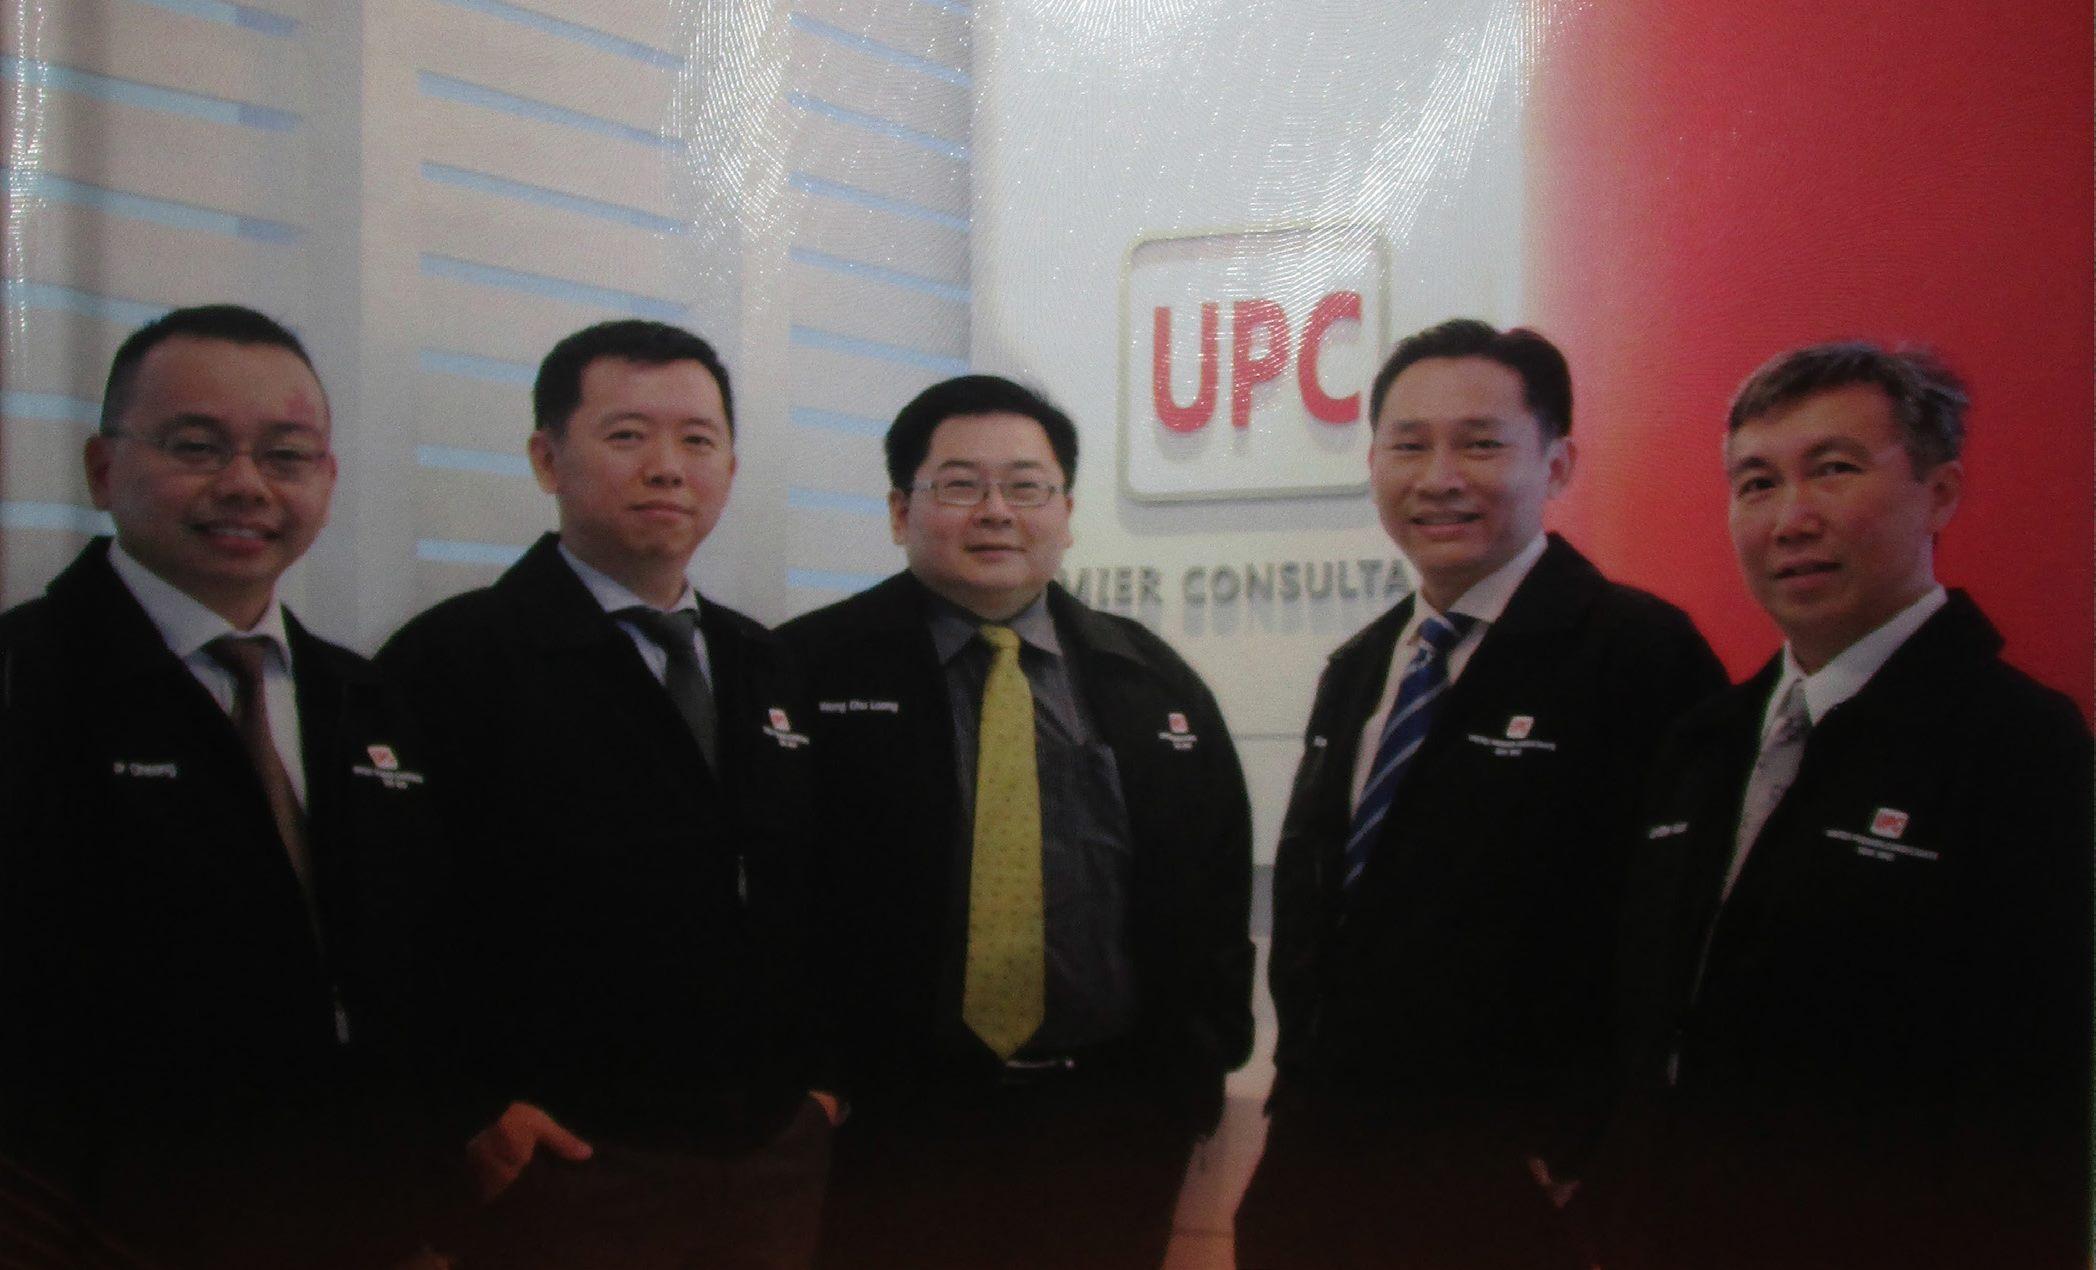 From Left To Right: Ir. Cheong Jong Peow, Ir. Yow Kai Yoong , Ir. Wong Chu Loong, Ir. Wong Koe Hoong, Ir. Lai Chee Kuan